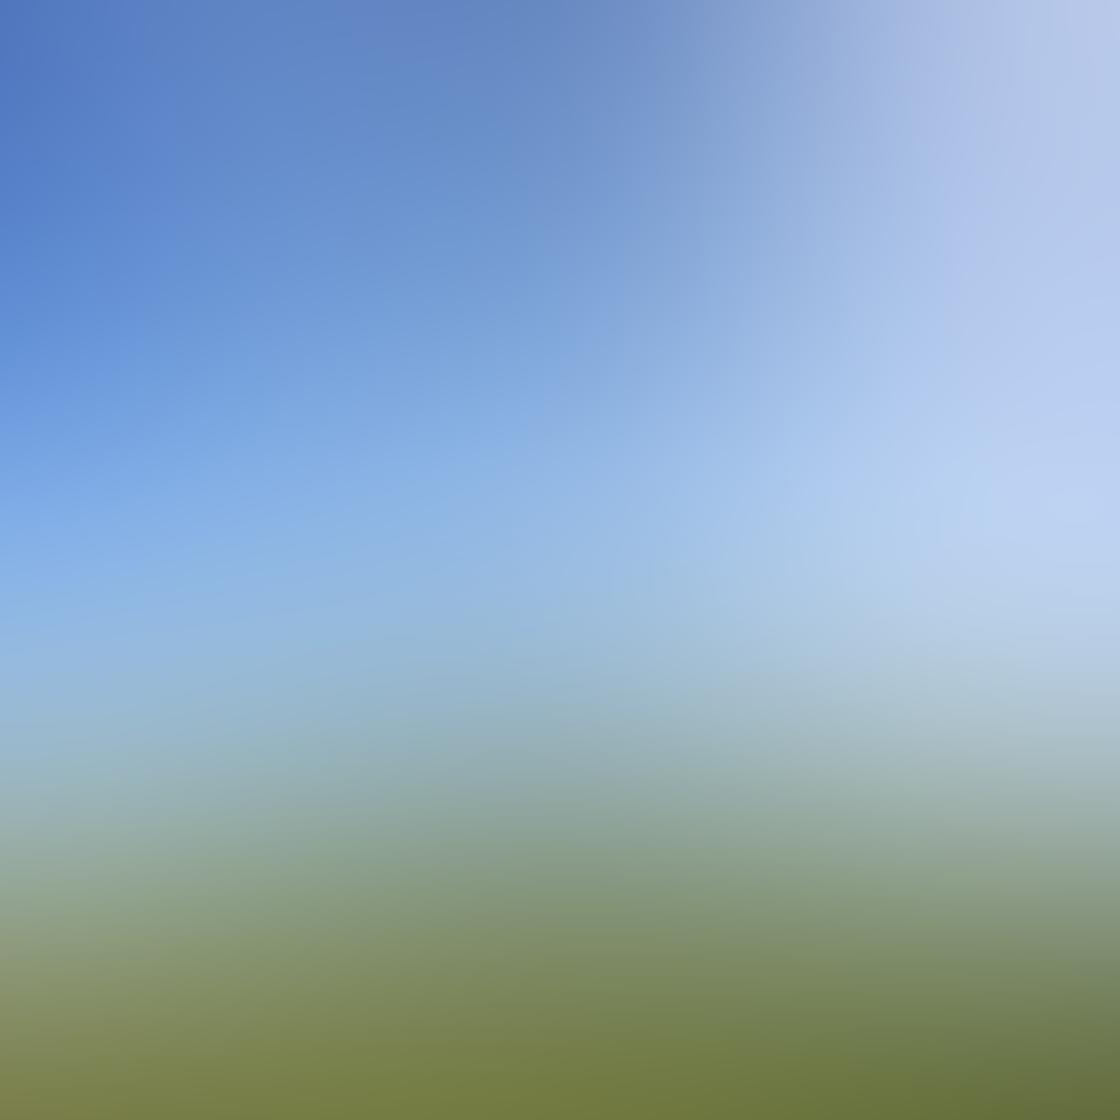 Minimalist Landscape iPhone Photos 19